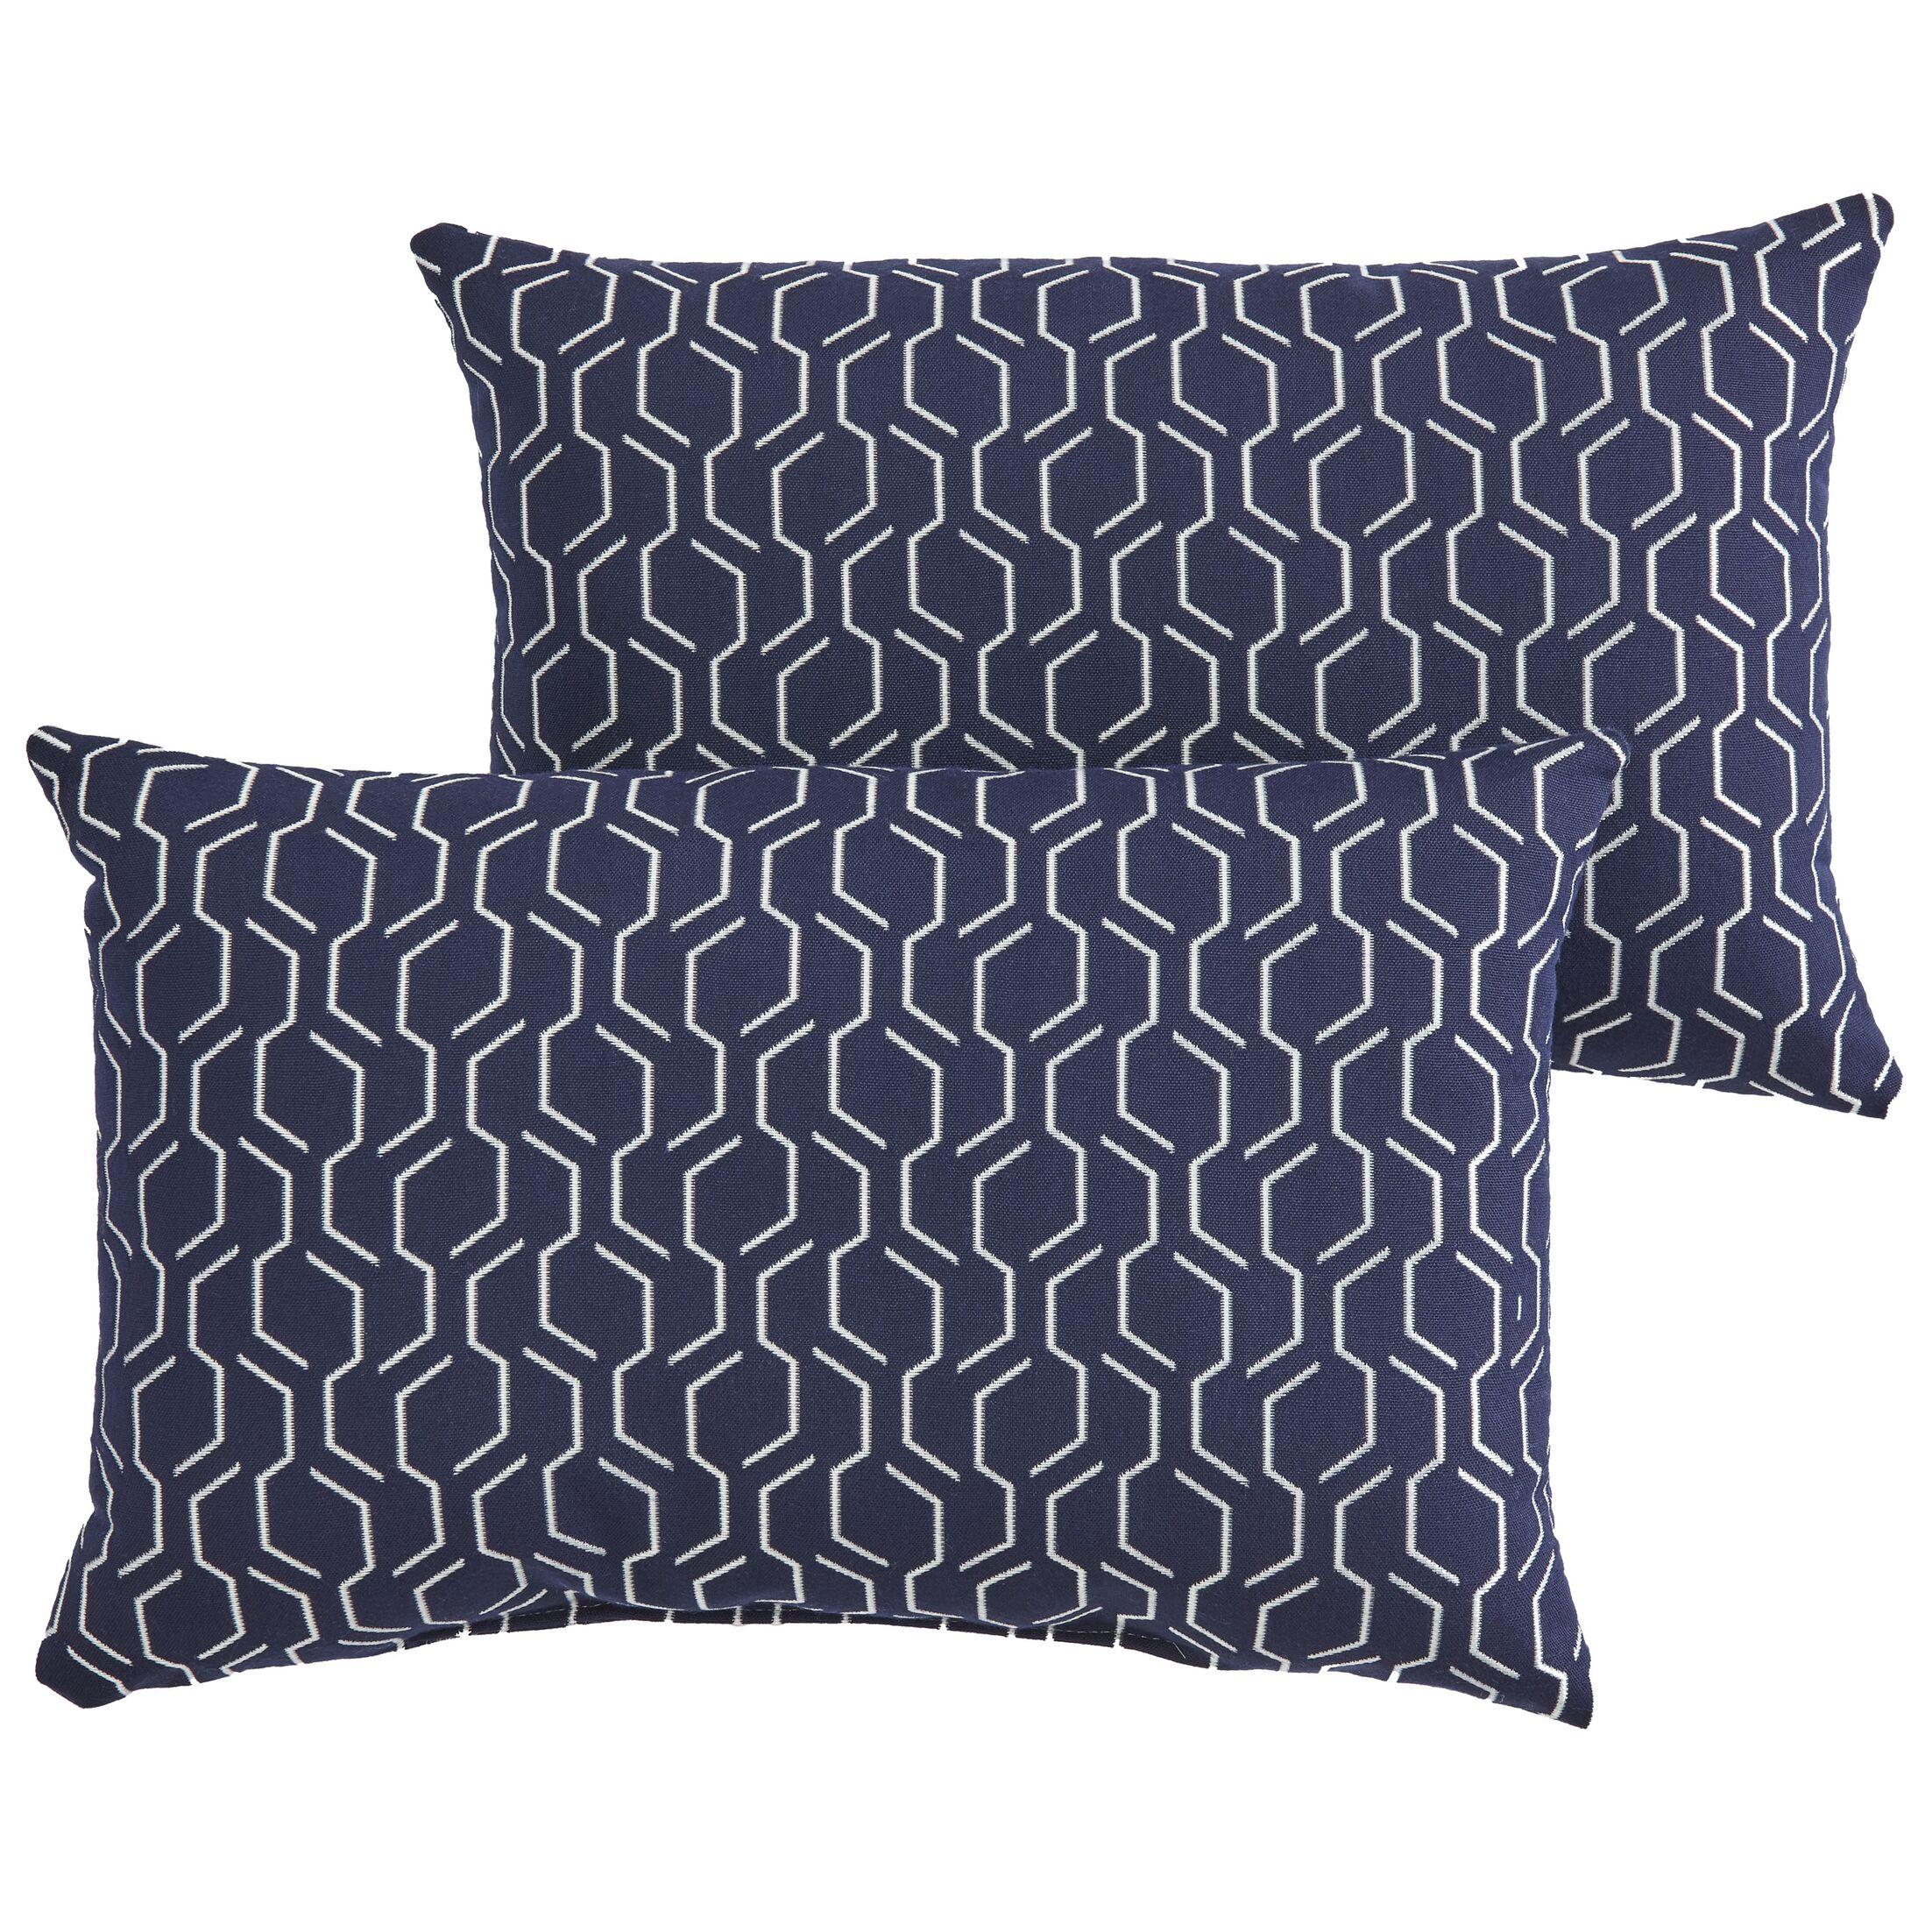 Hugo Indoor/Outdoor Sunbrella Lumbar Pillow Size: 12